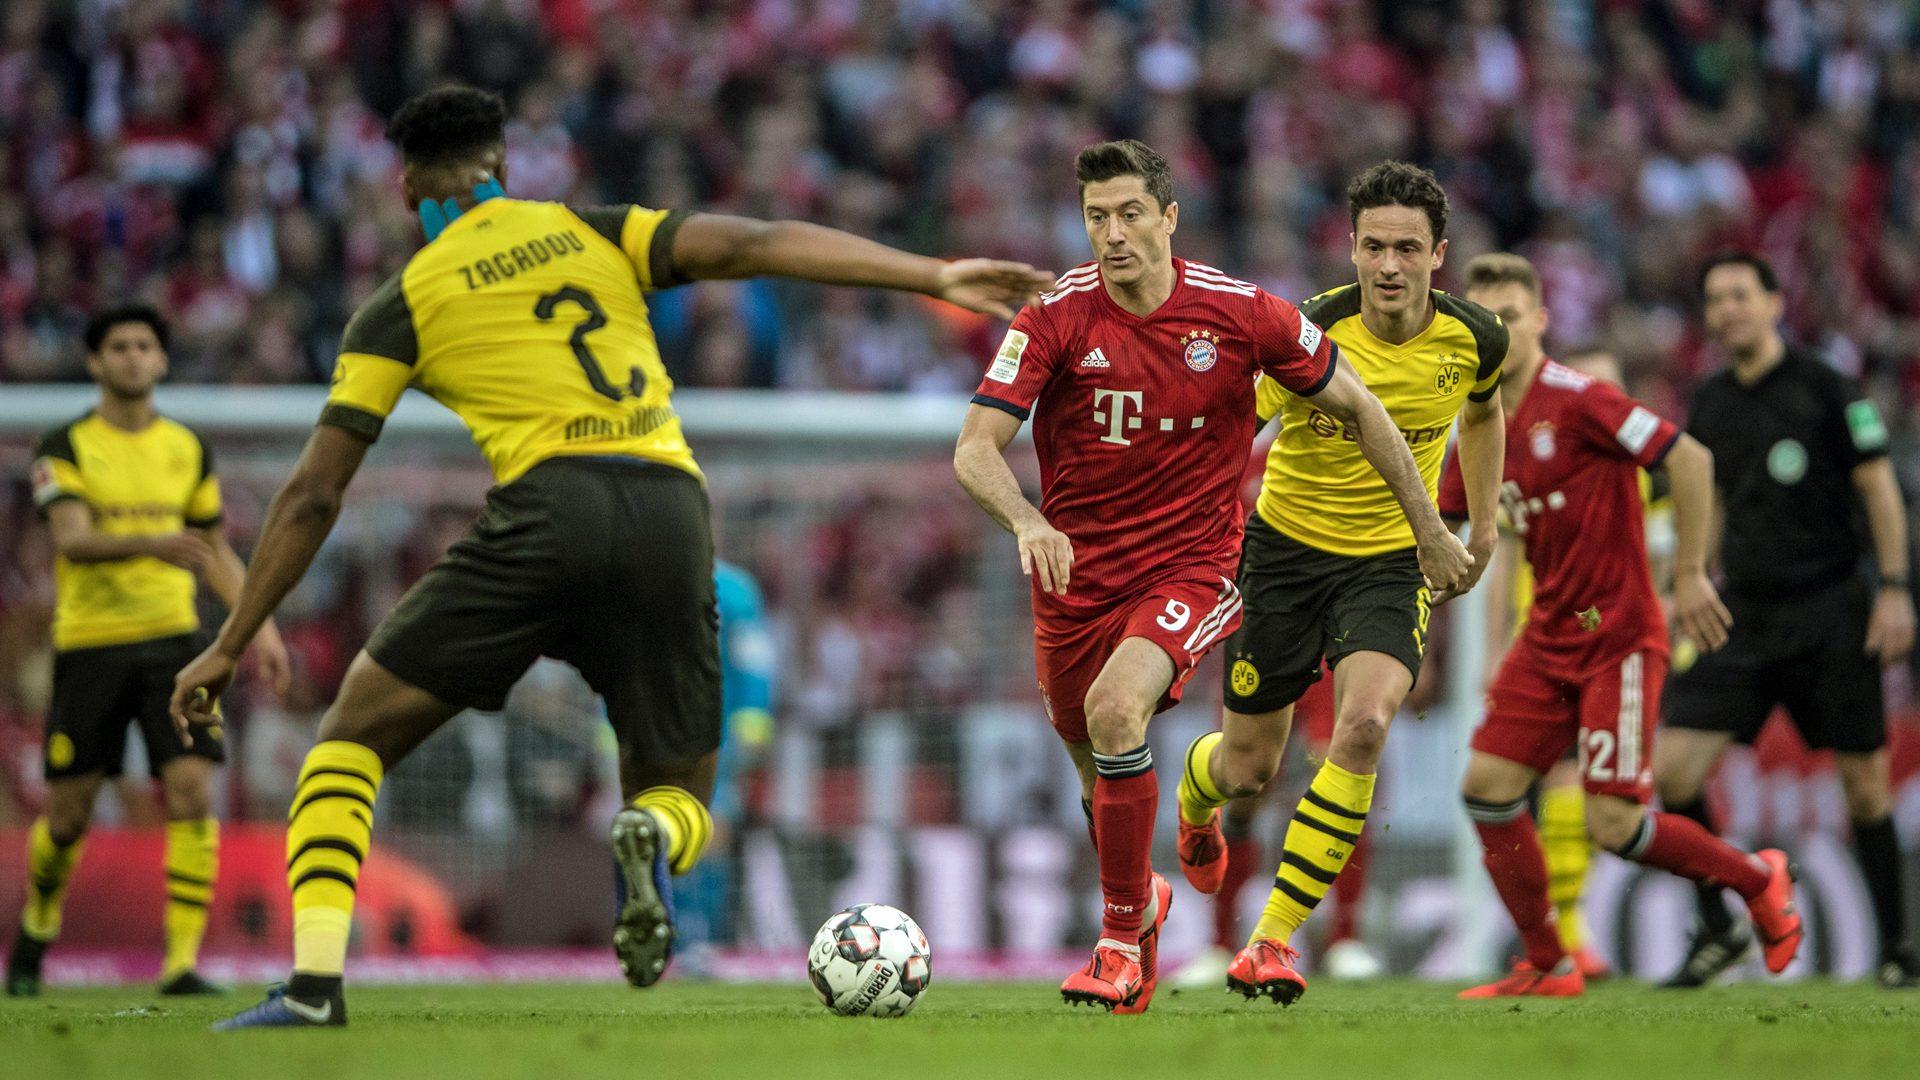 Bundesliga Bayern Munich Vs Borussia Dortmund How Do They Compare